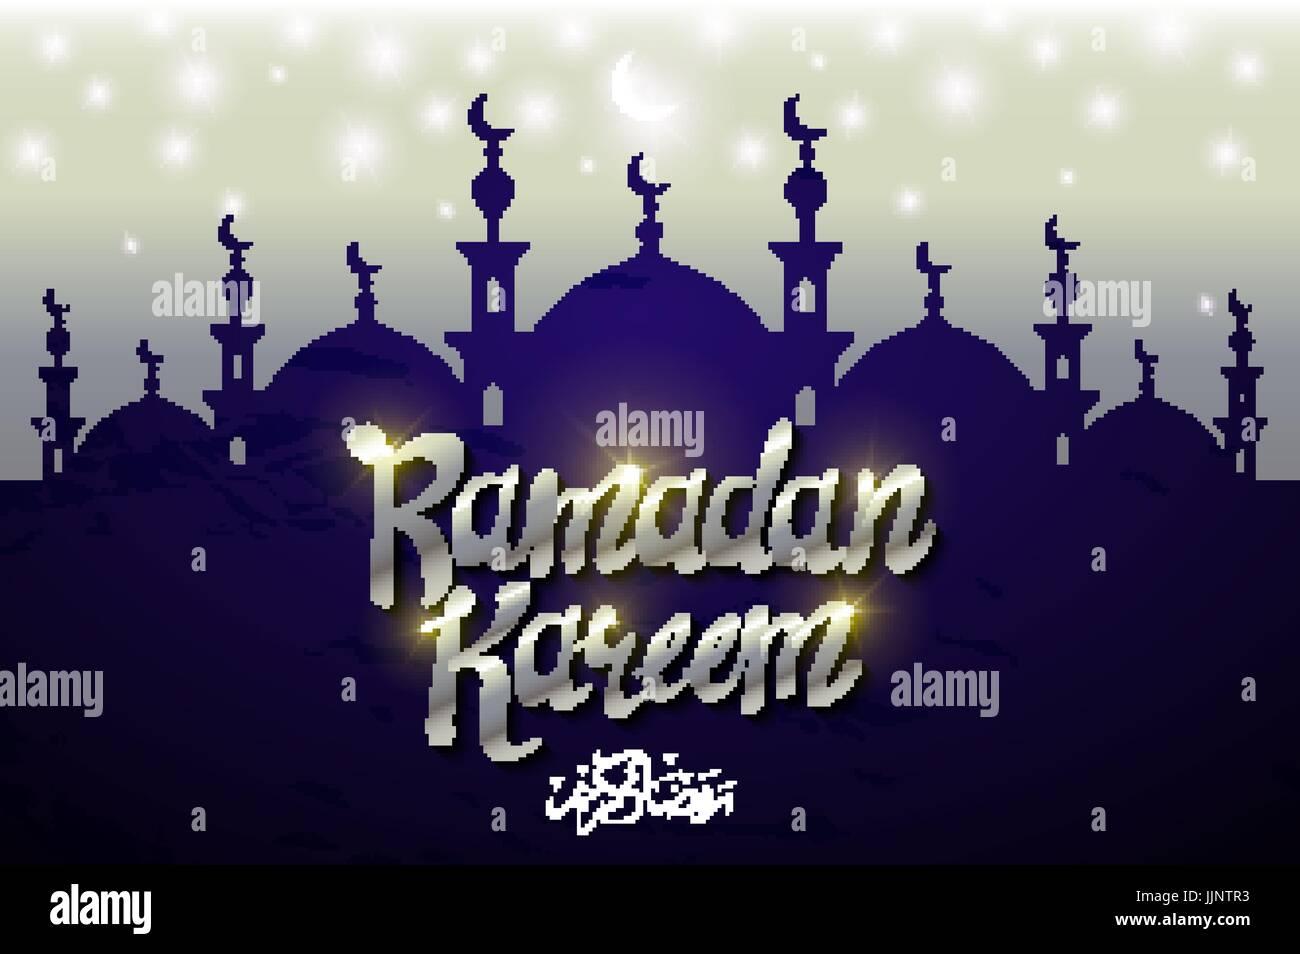 Ramadan kareem beautiful greeting card with arabic calligraphy which ramadan kareem beautiful greeting card with arabic calligraphy which means ramadan kareem art m4hsunfo